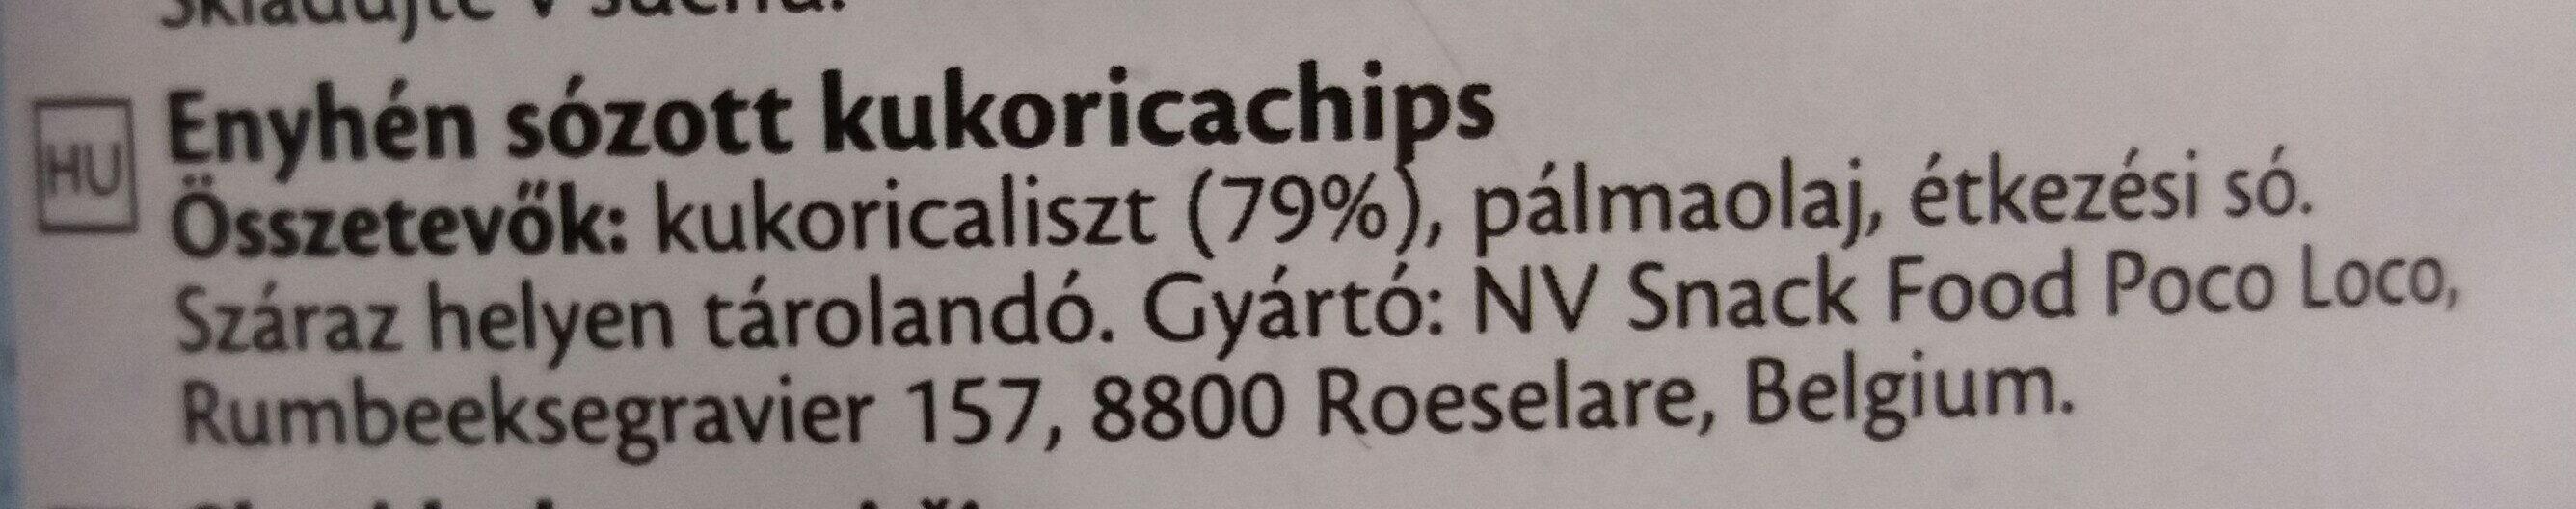 Tortilla chips - Ingredients - hu